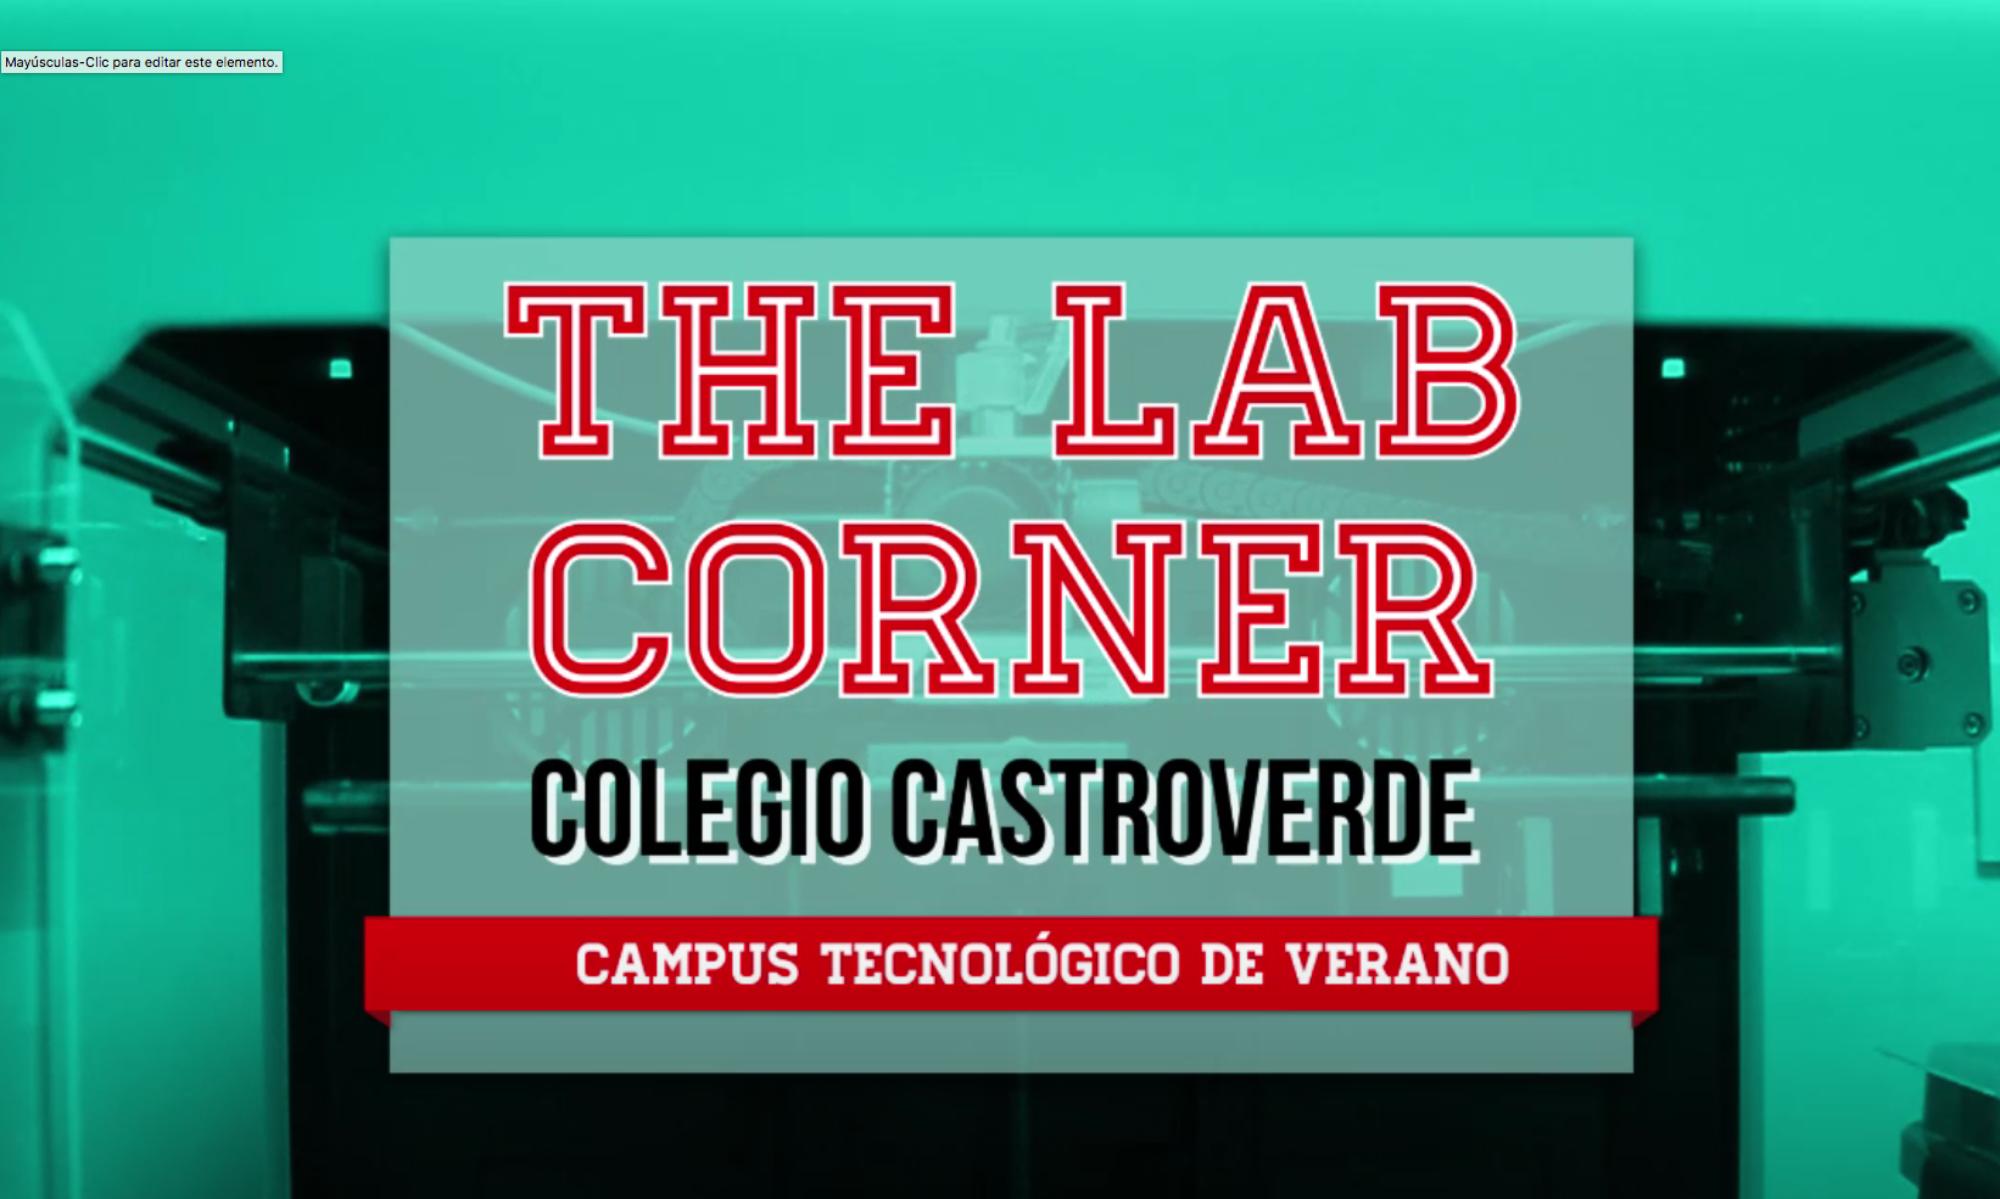 THE LAB CORNER